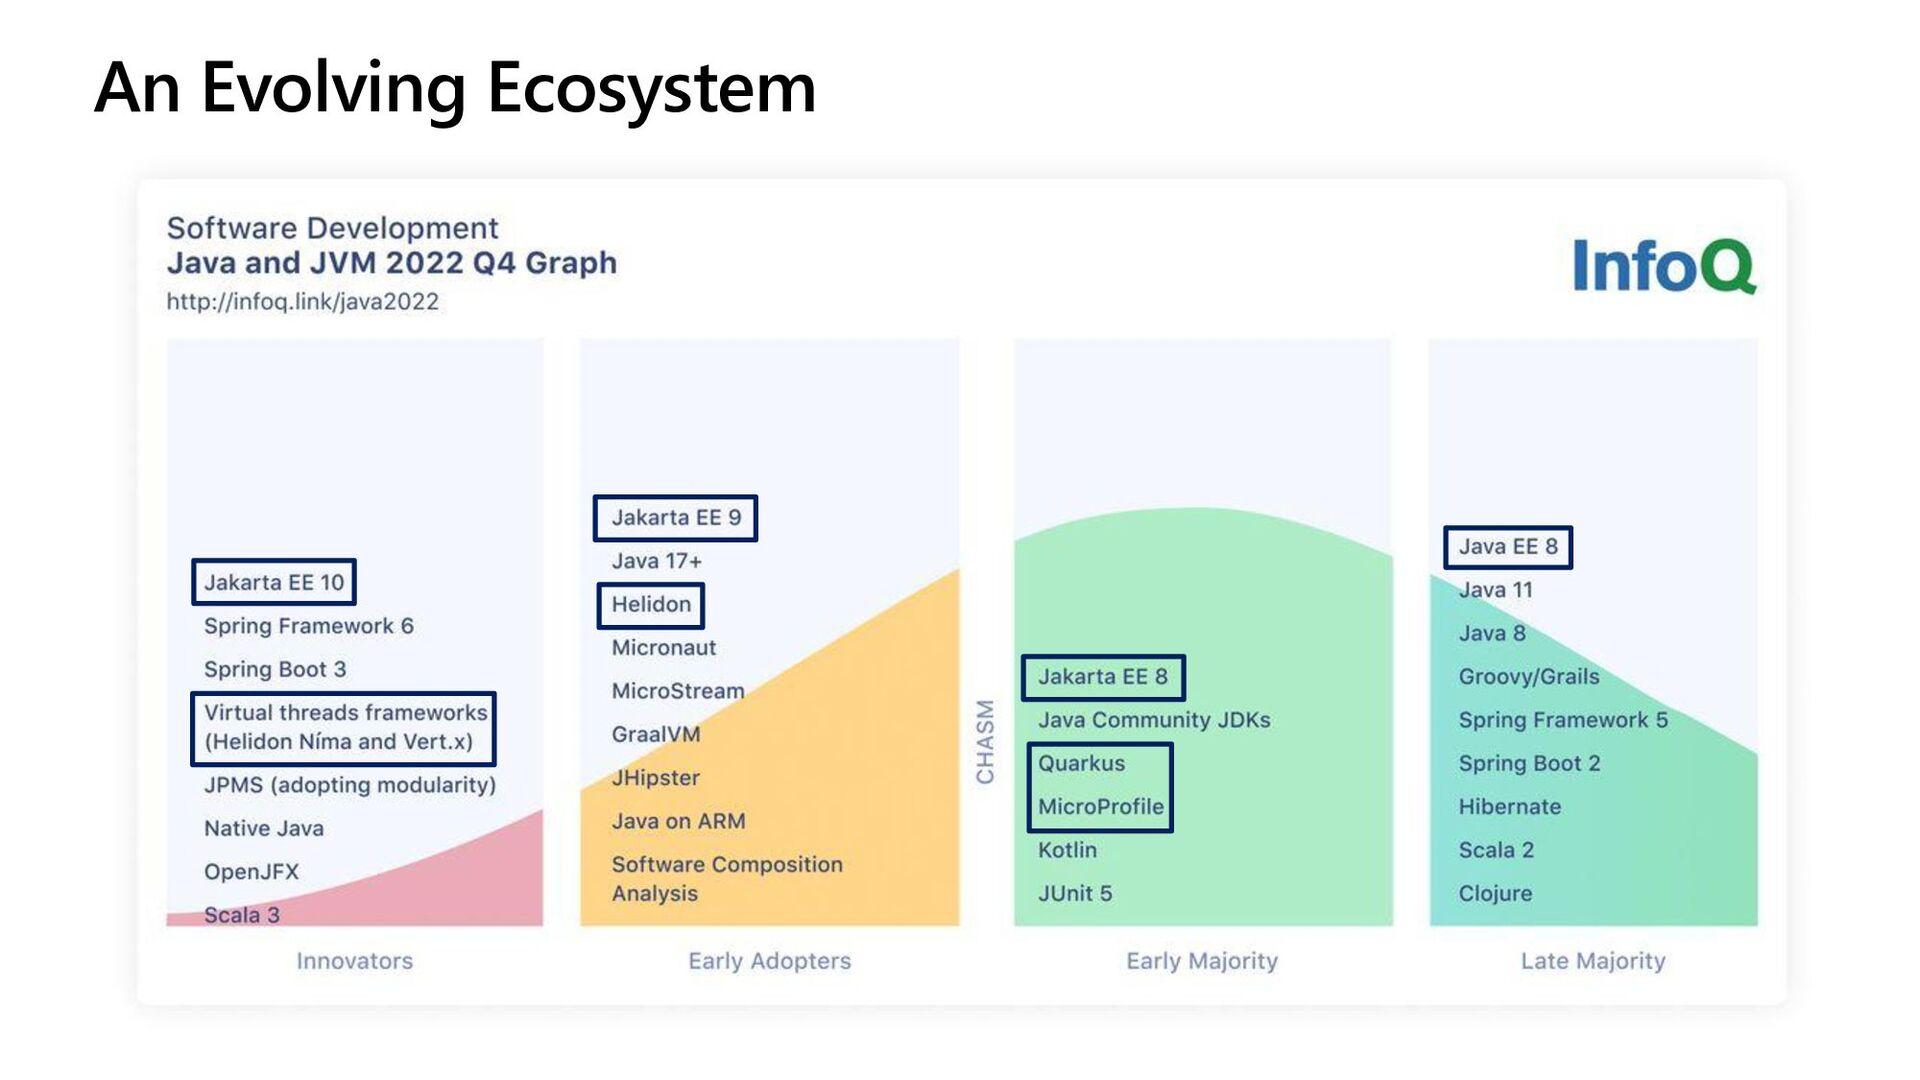 An Evolving Ecosystem